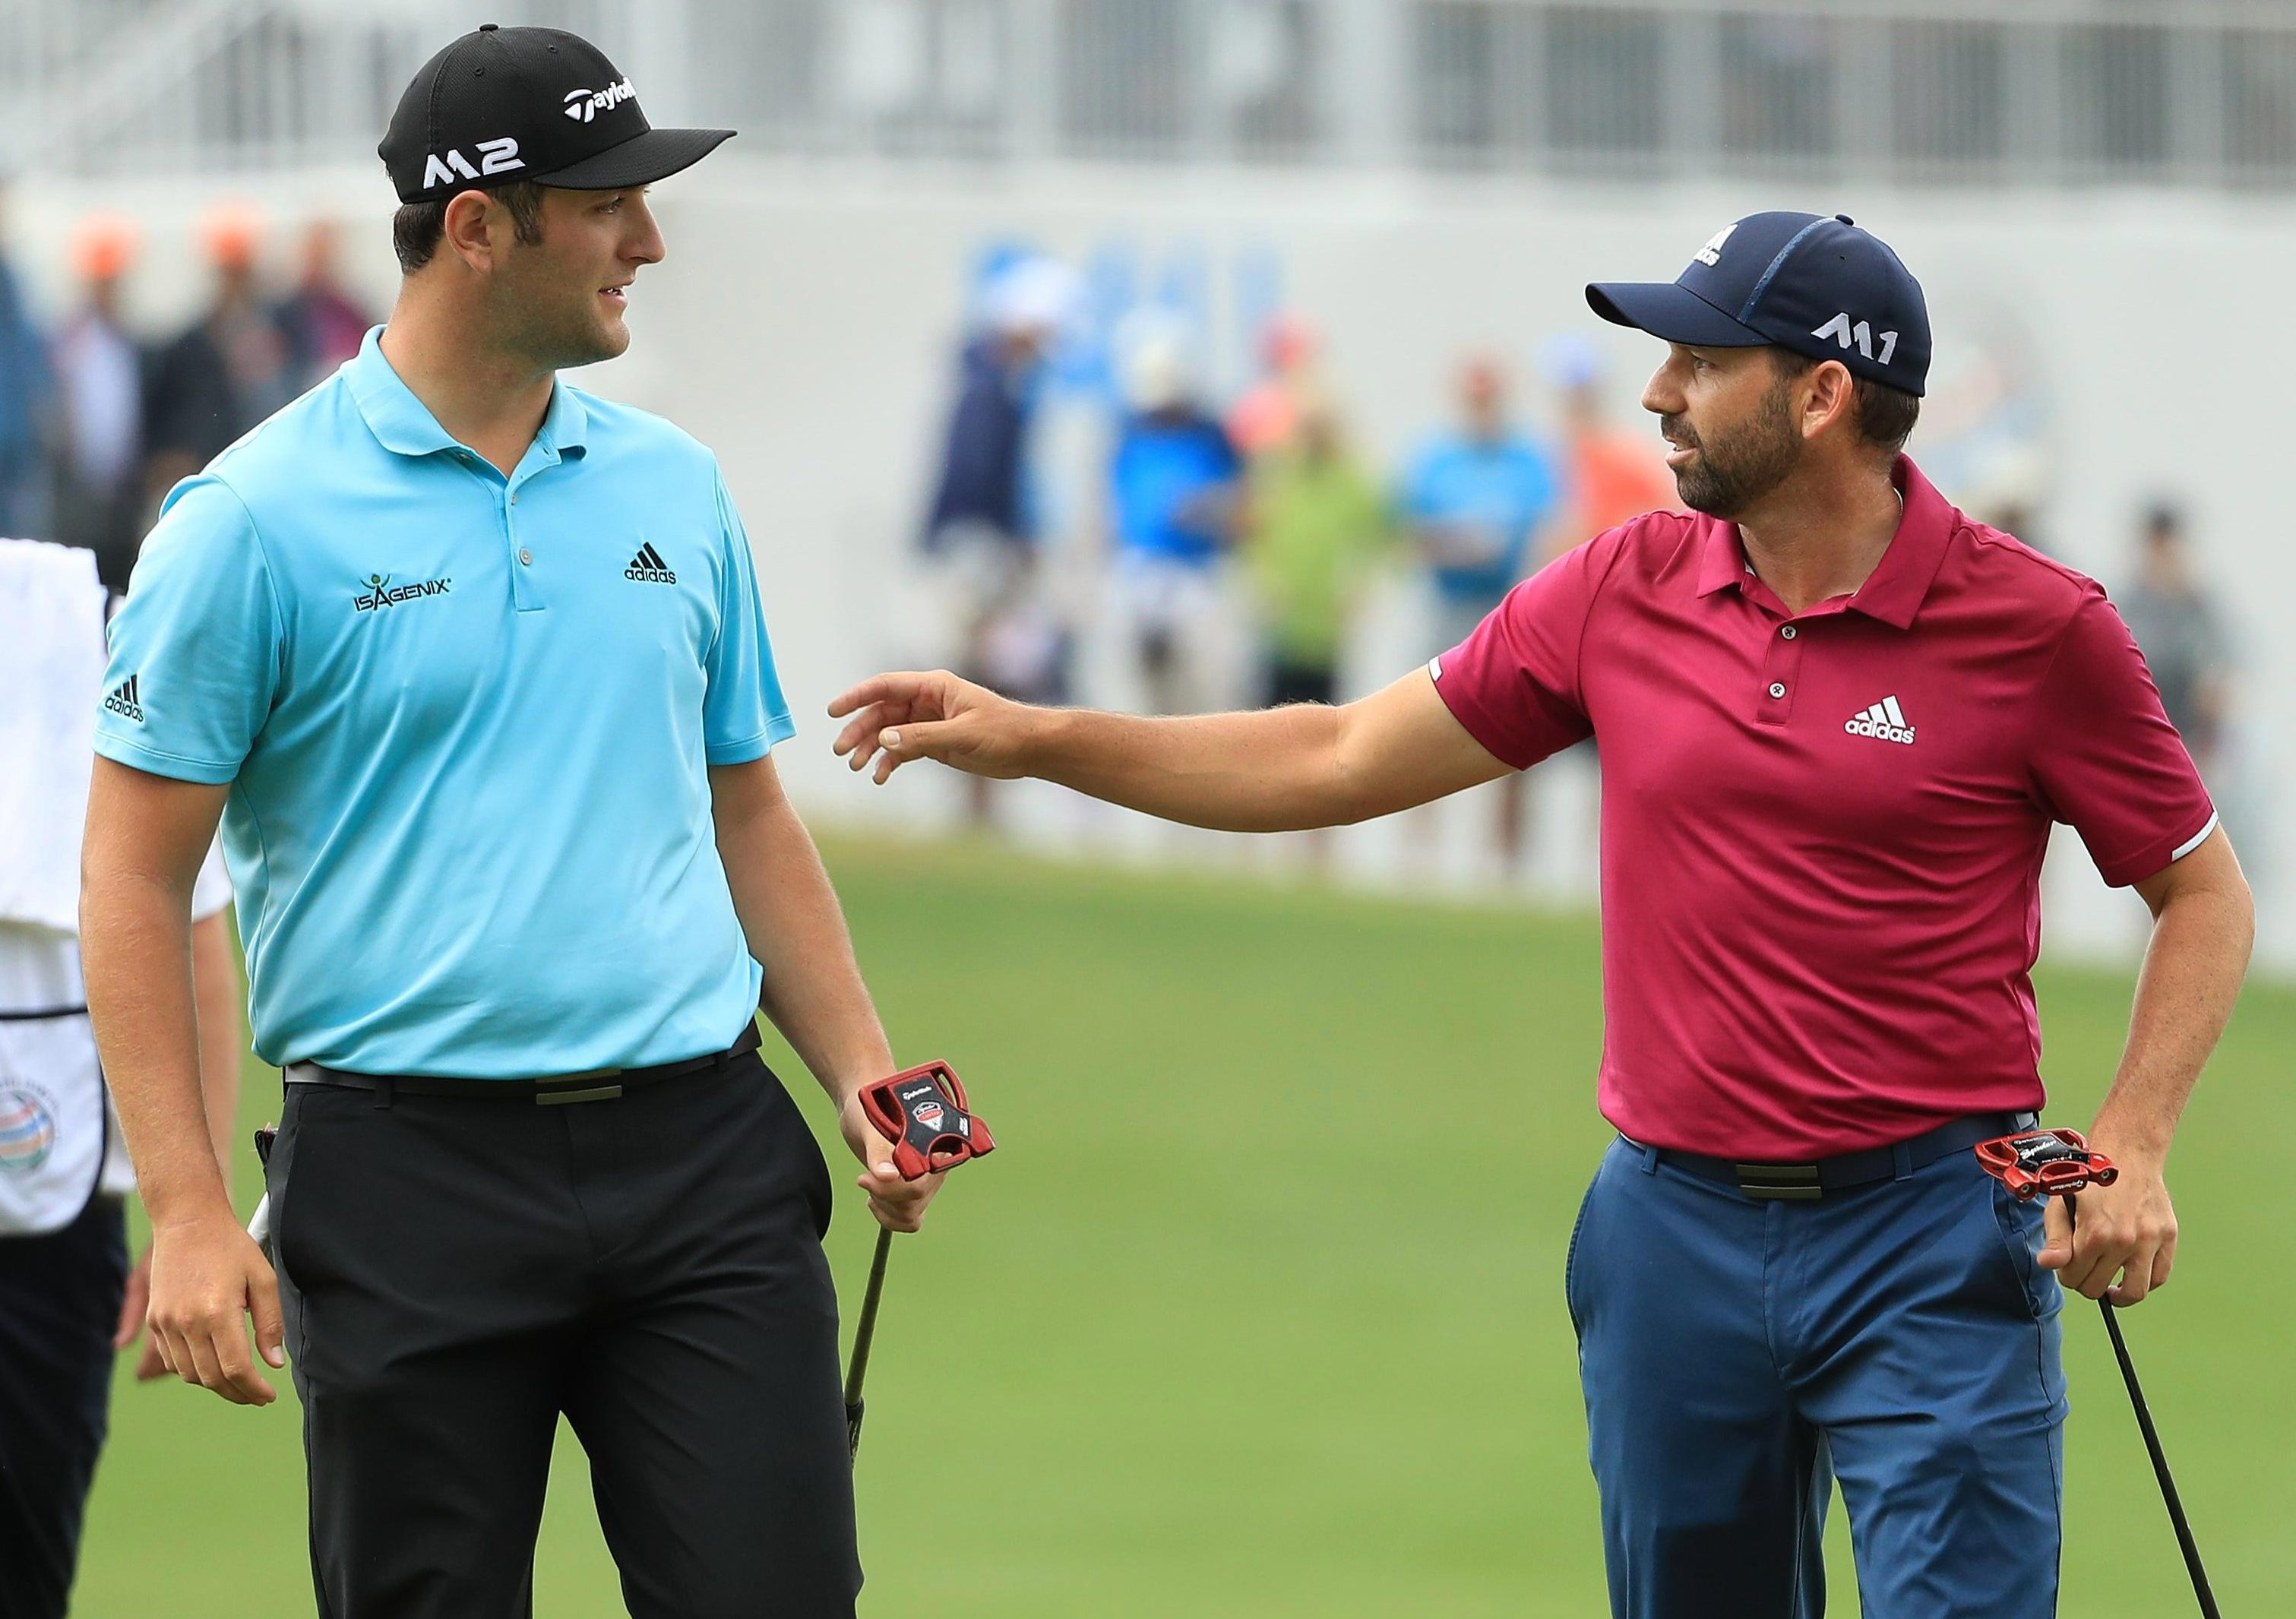 Garcia could mentor fellow Spaniard Jon Rahm